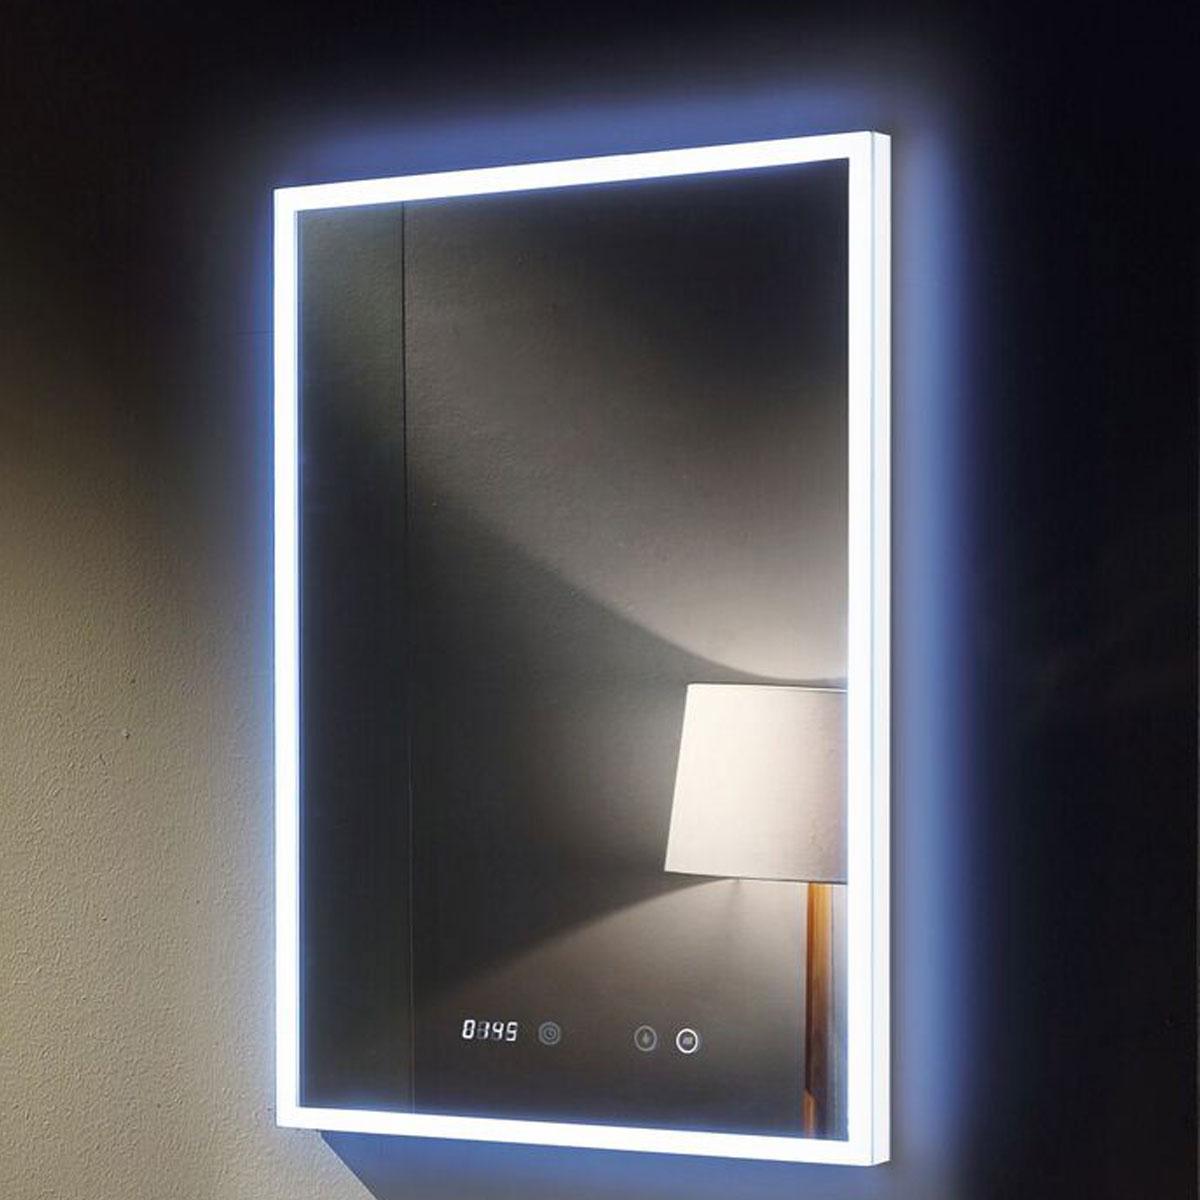 Venus deluxe led backlit mirror digital clock 60cm x 80 cm for Mirror 60cm x 80cm